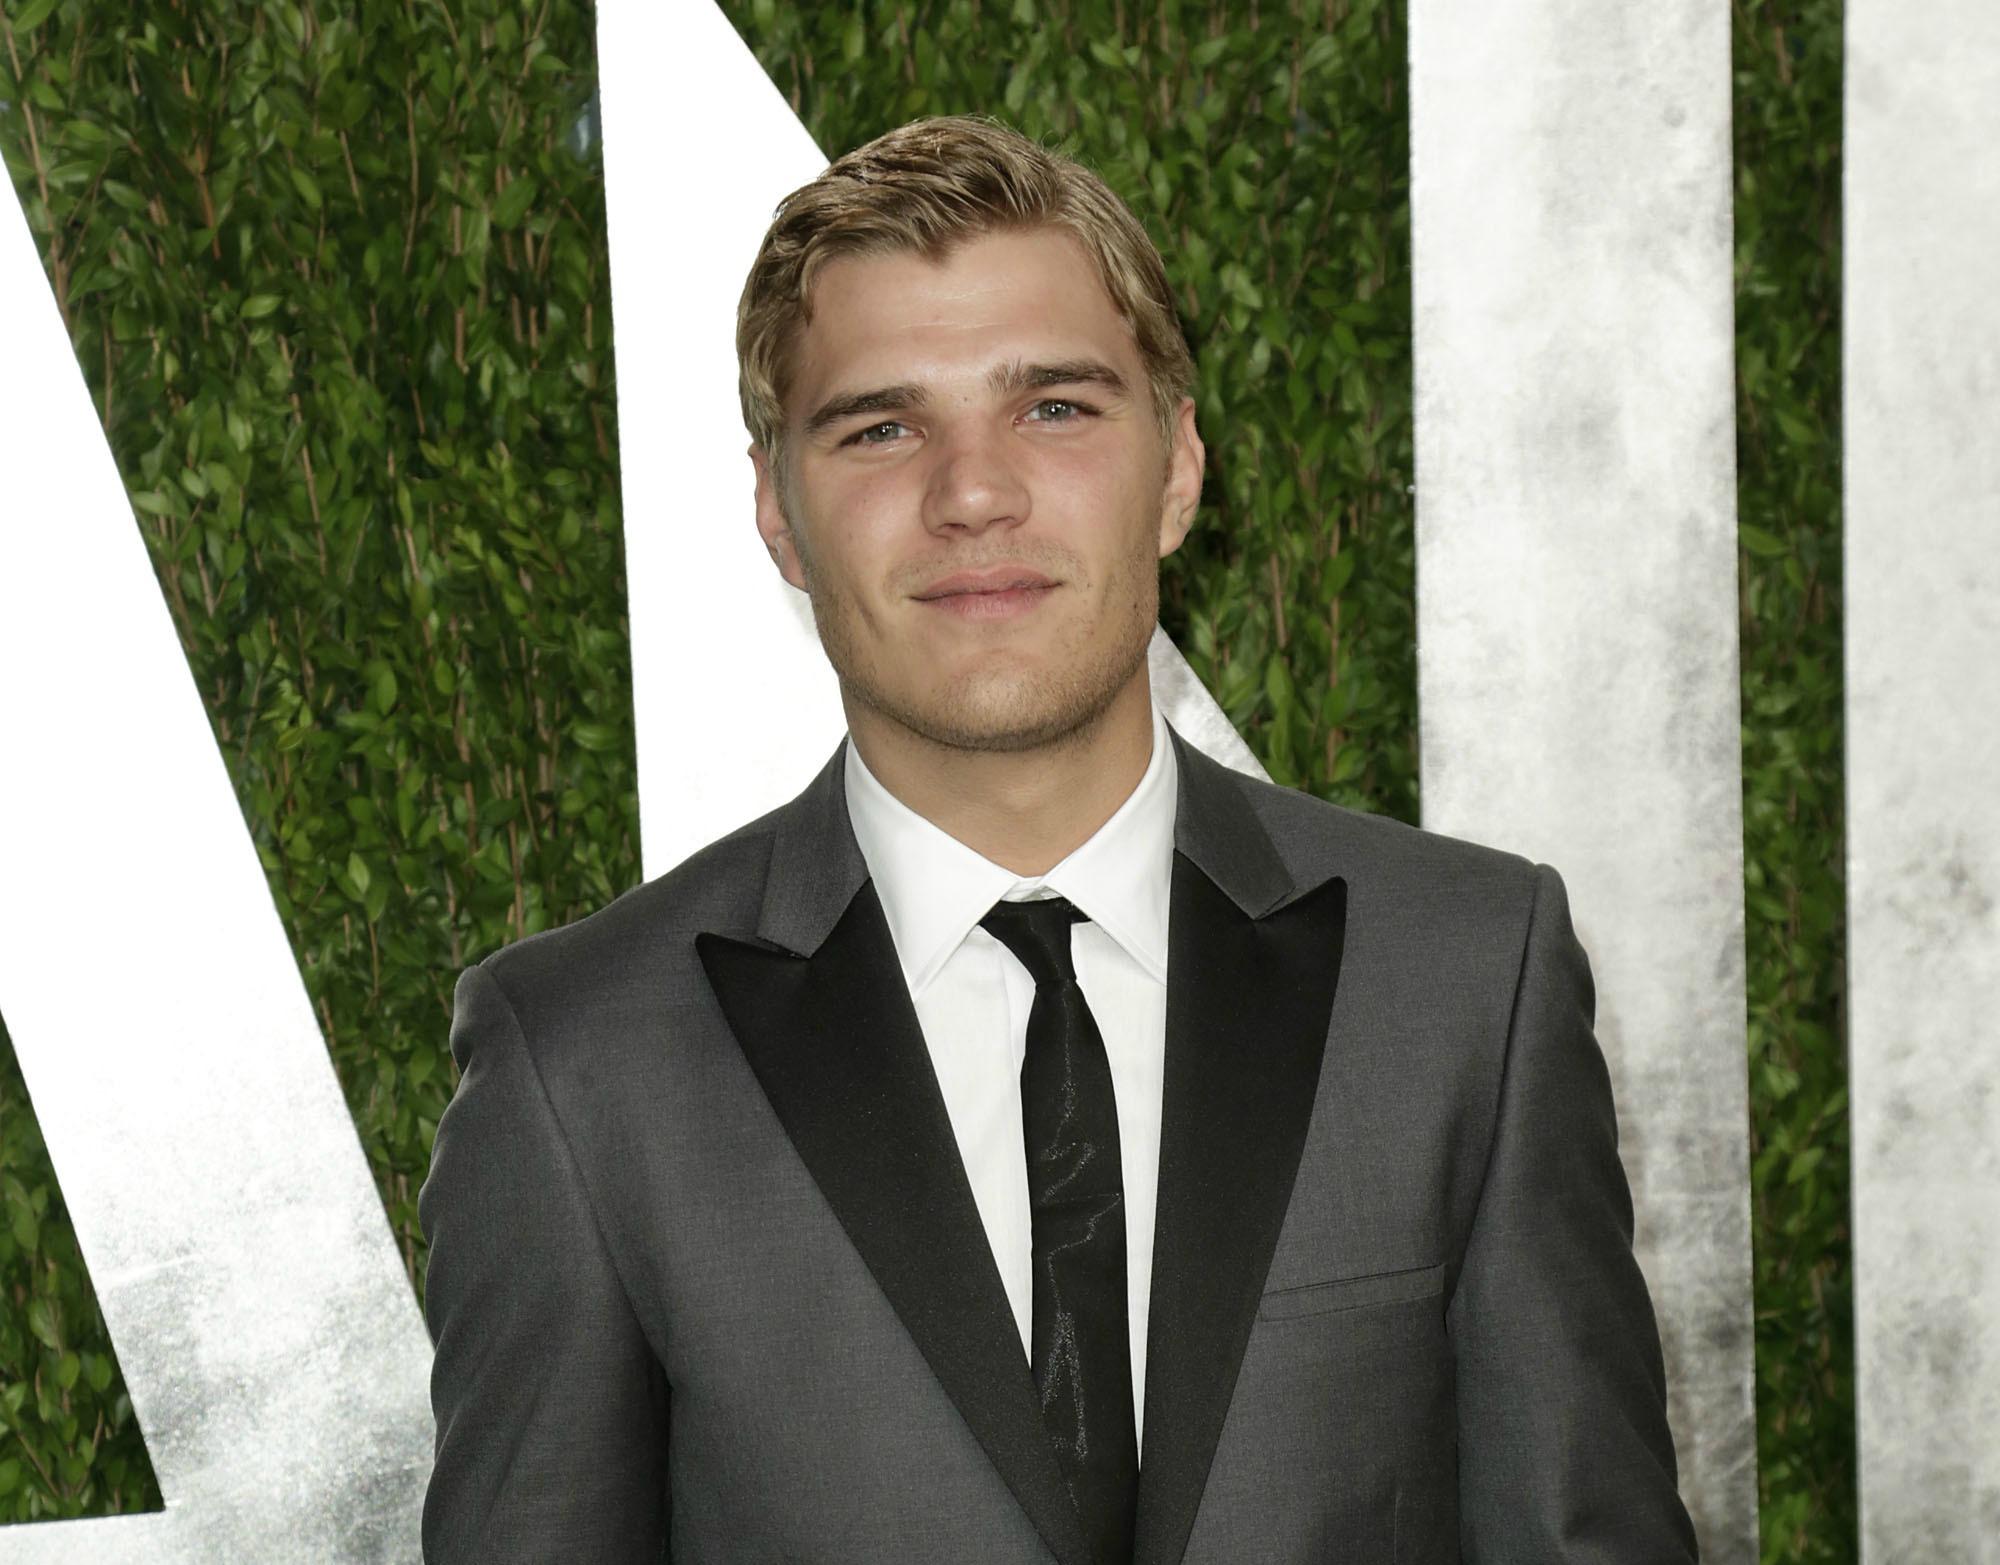 Chris Zylka engaged to model girlfriend Hanna Beth